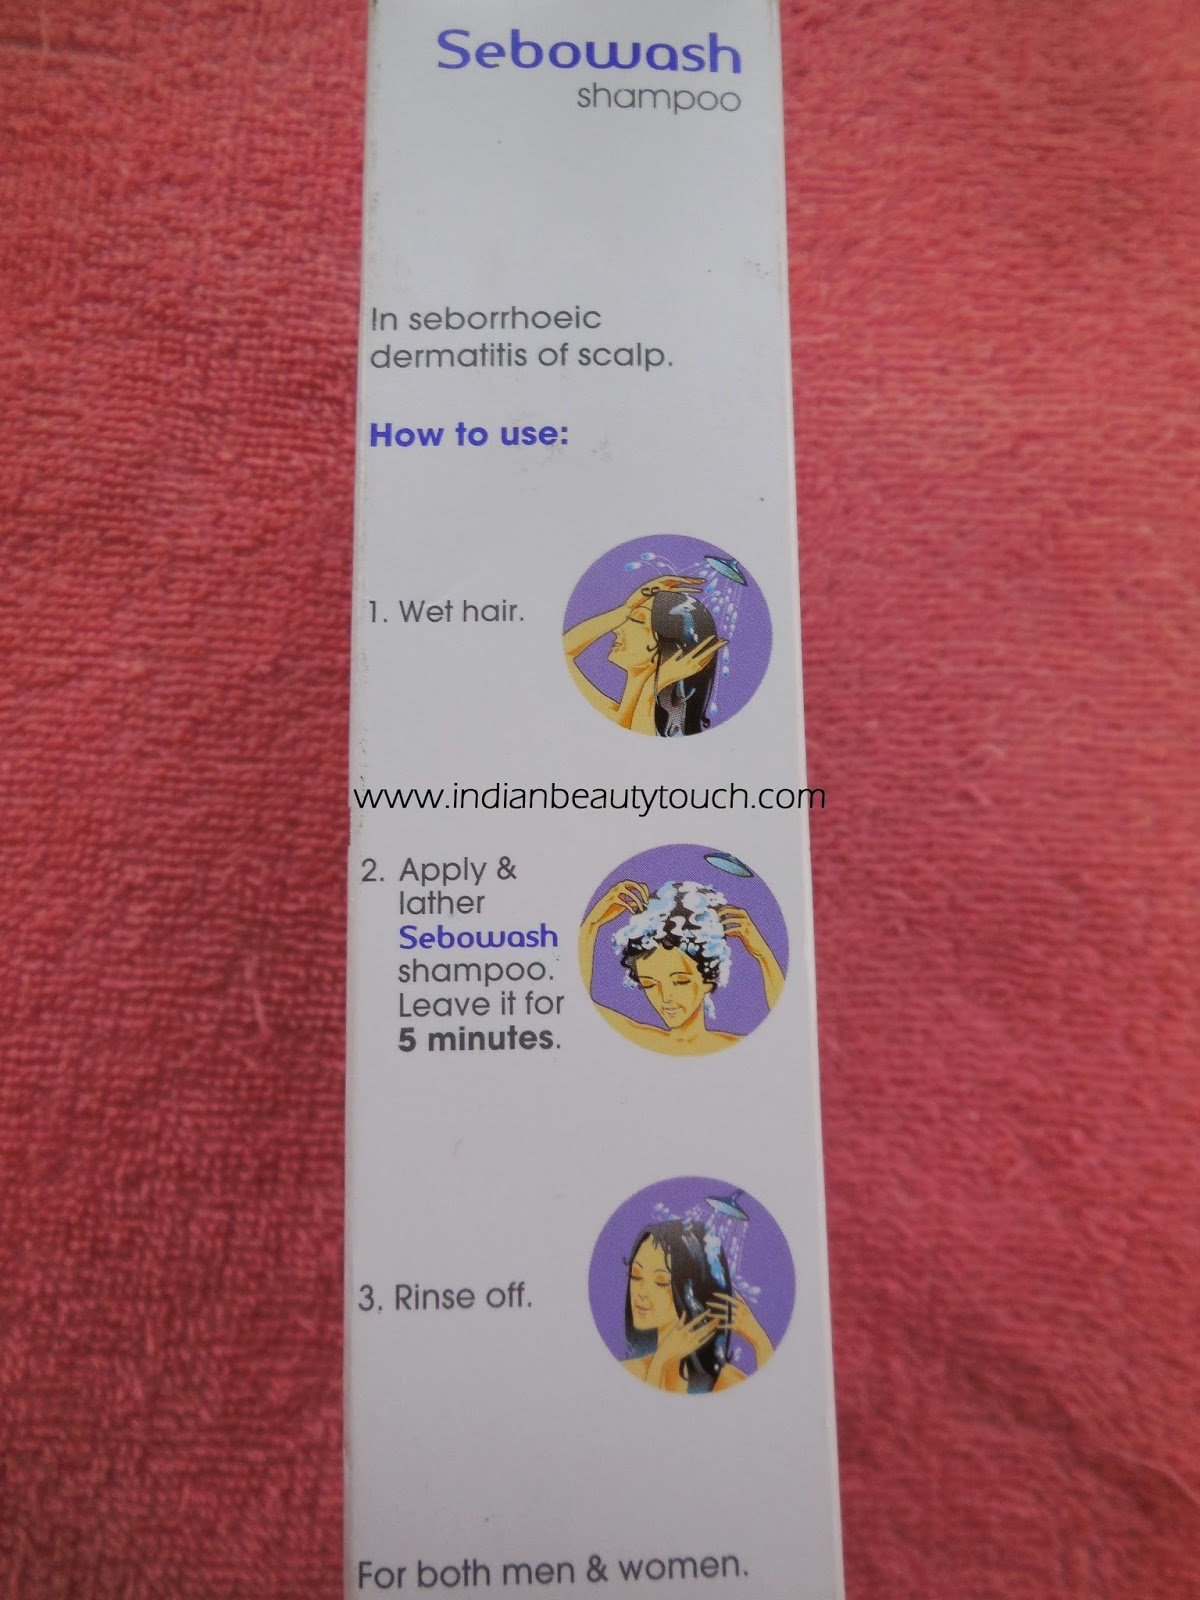 Sebowash Shampoo by Cipla Review , Hair Care, Hair Product, Product Review, Shampoo, Shampoo for dandruff, Shampoo for Hair Fall